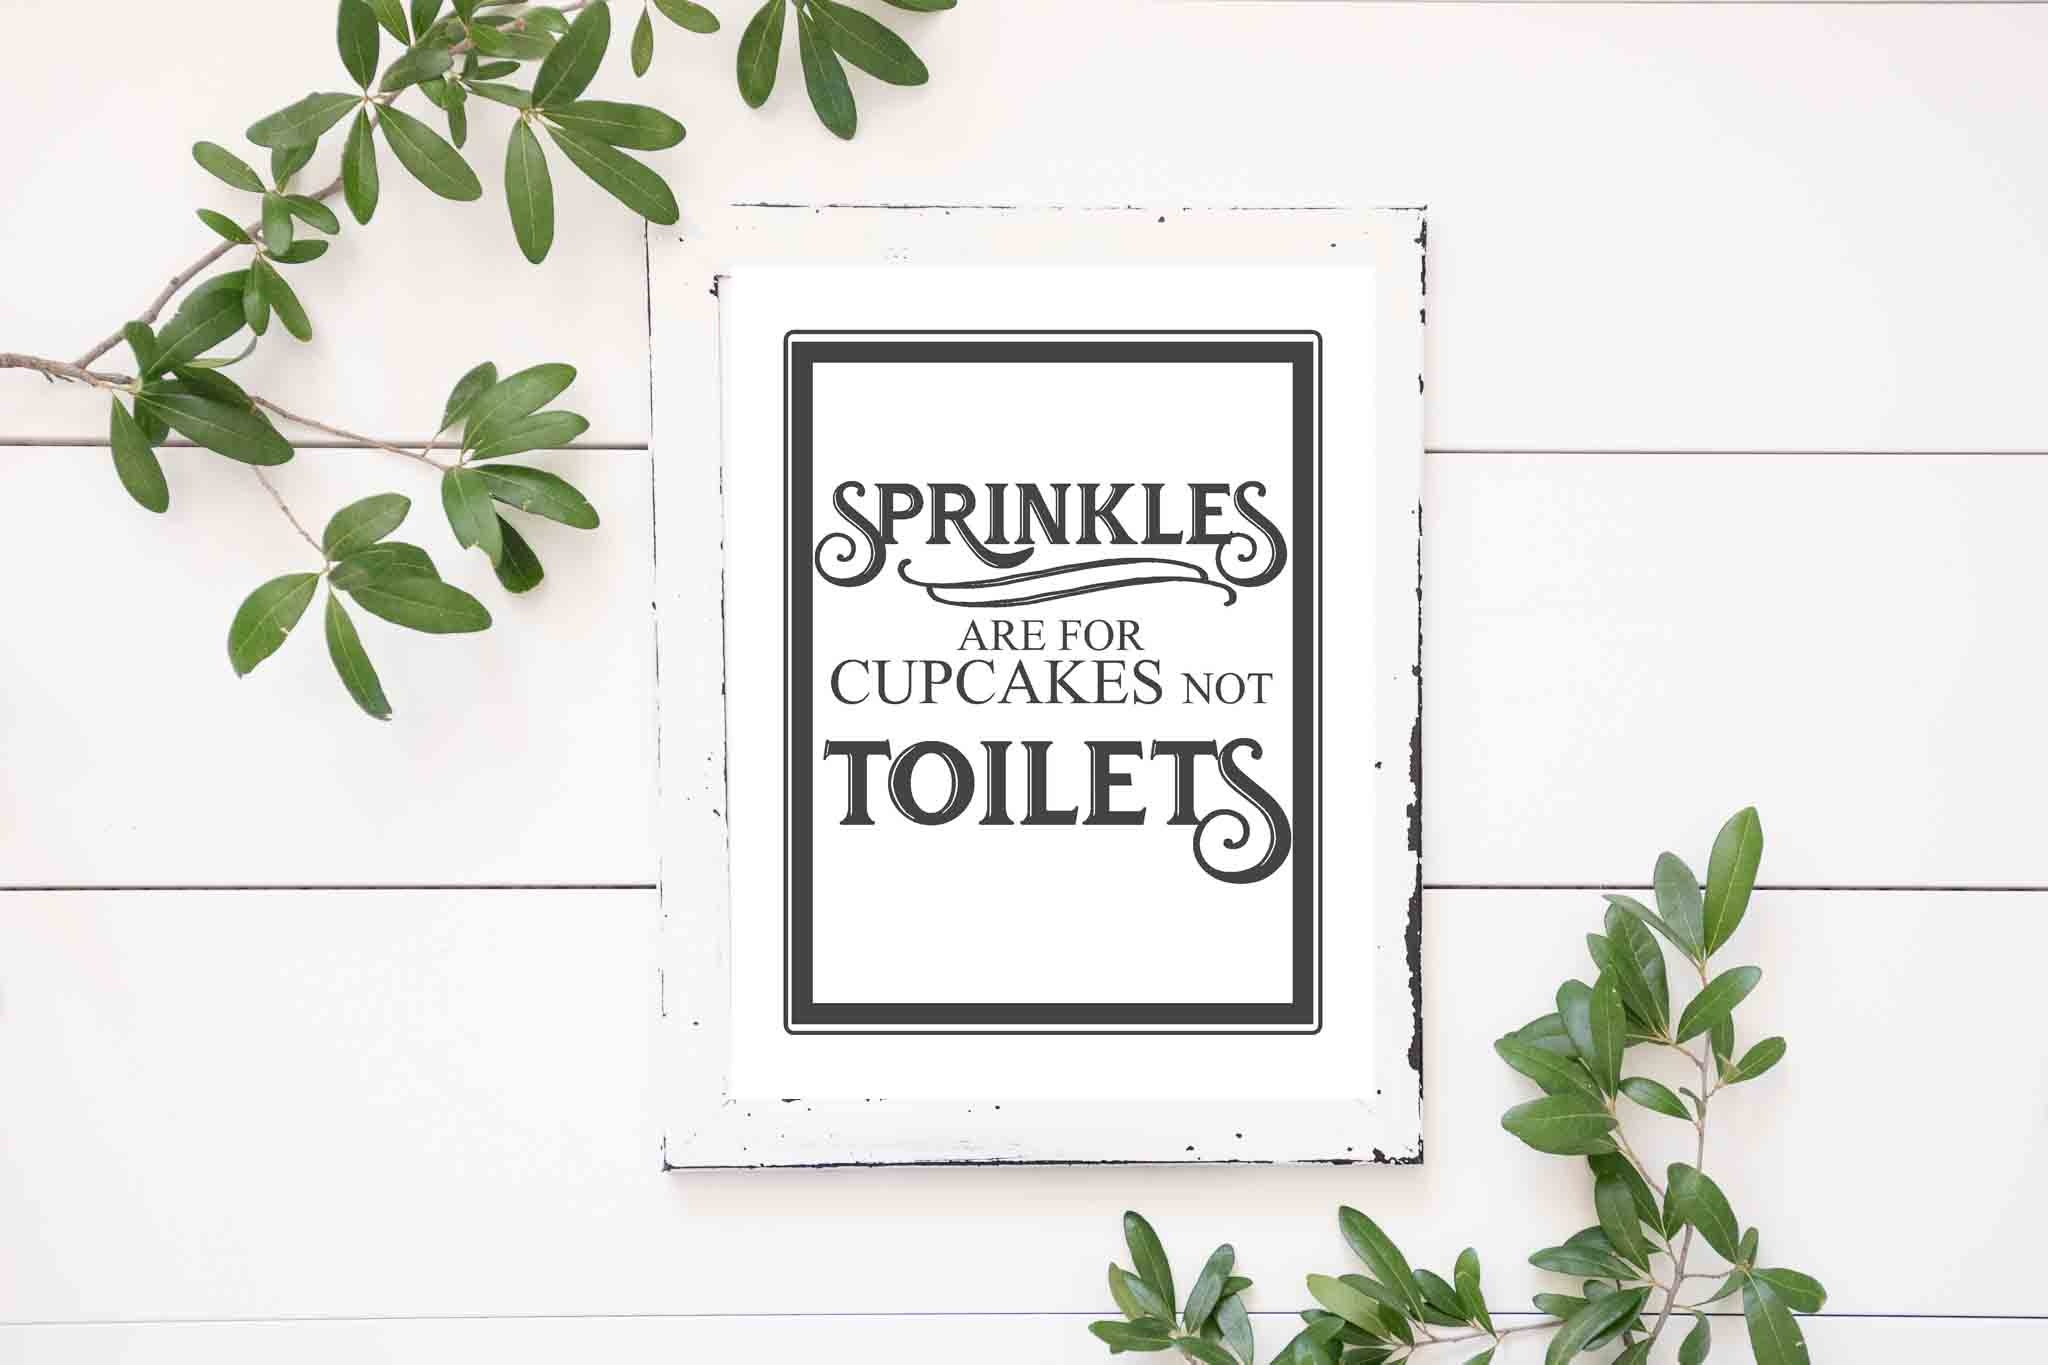 Free Vintage Bathroom Printables - The Mountain View Cottage - Free Printable Wall Art For Bathroom